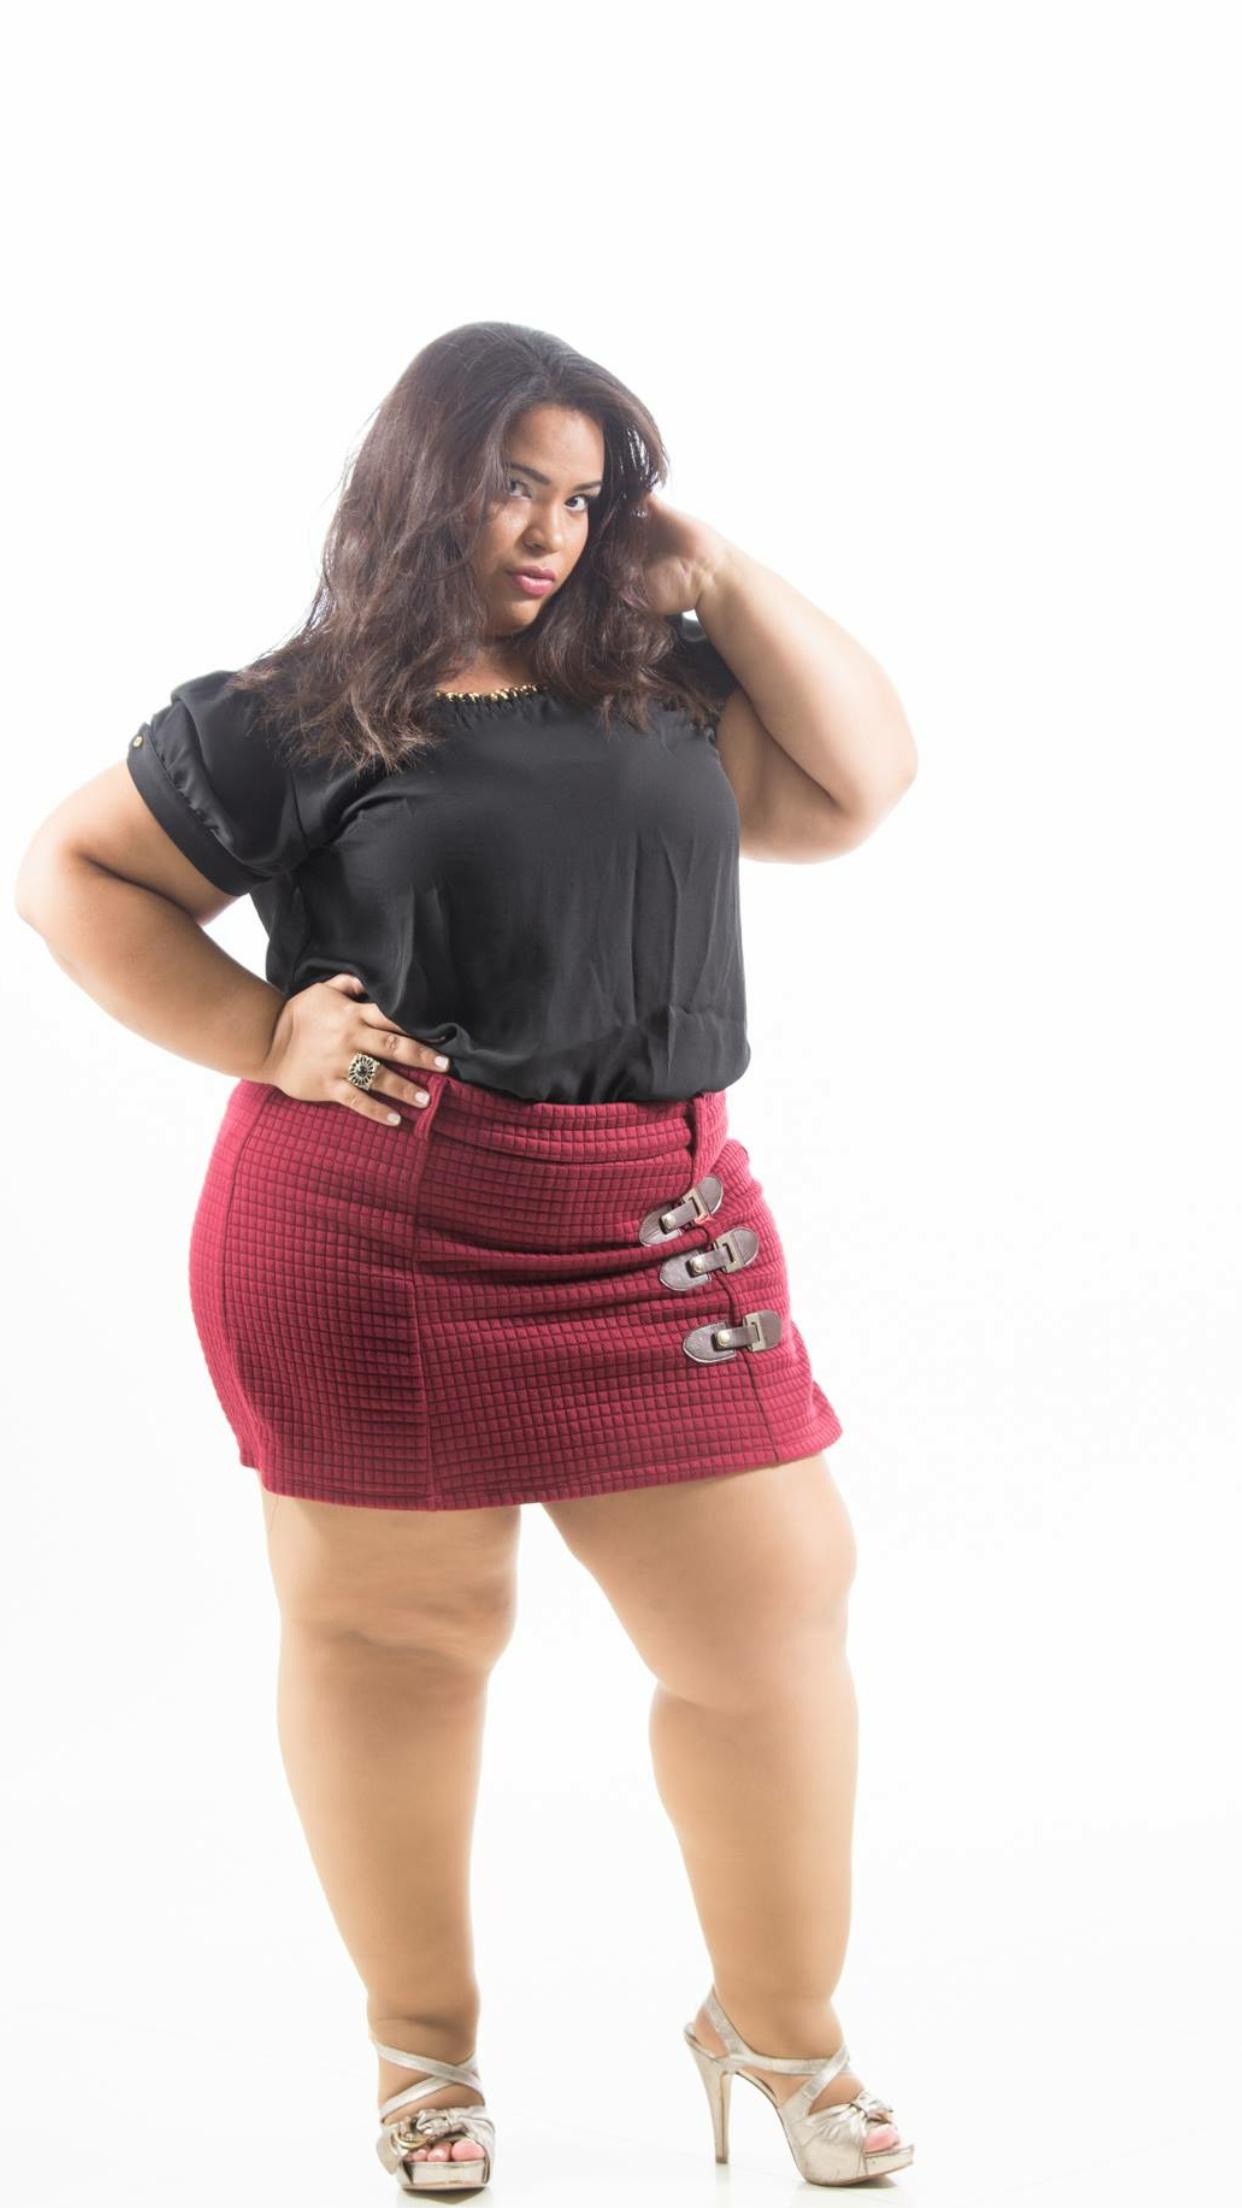 skirt short Big legs